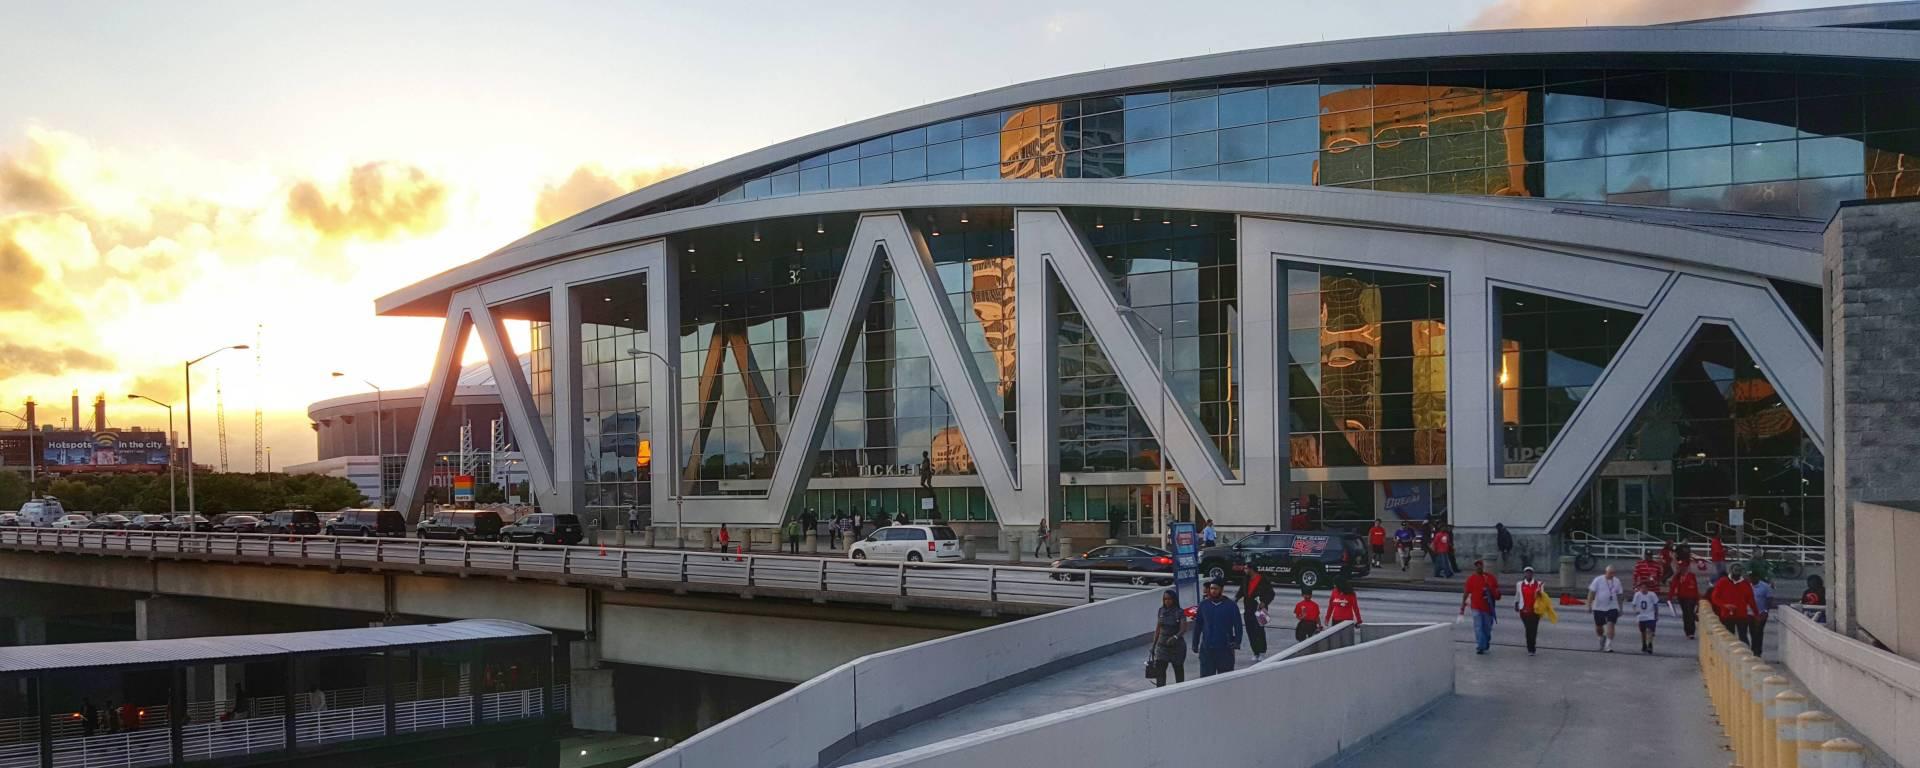 Washington Wizards Blog - Phillips Arena